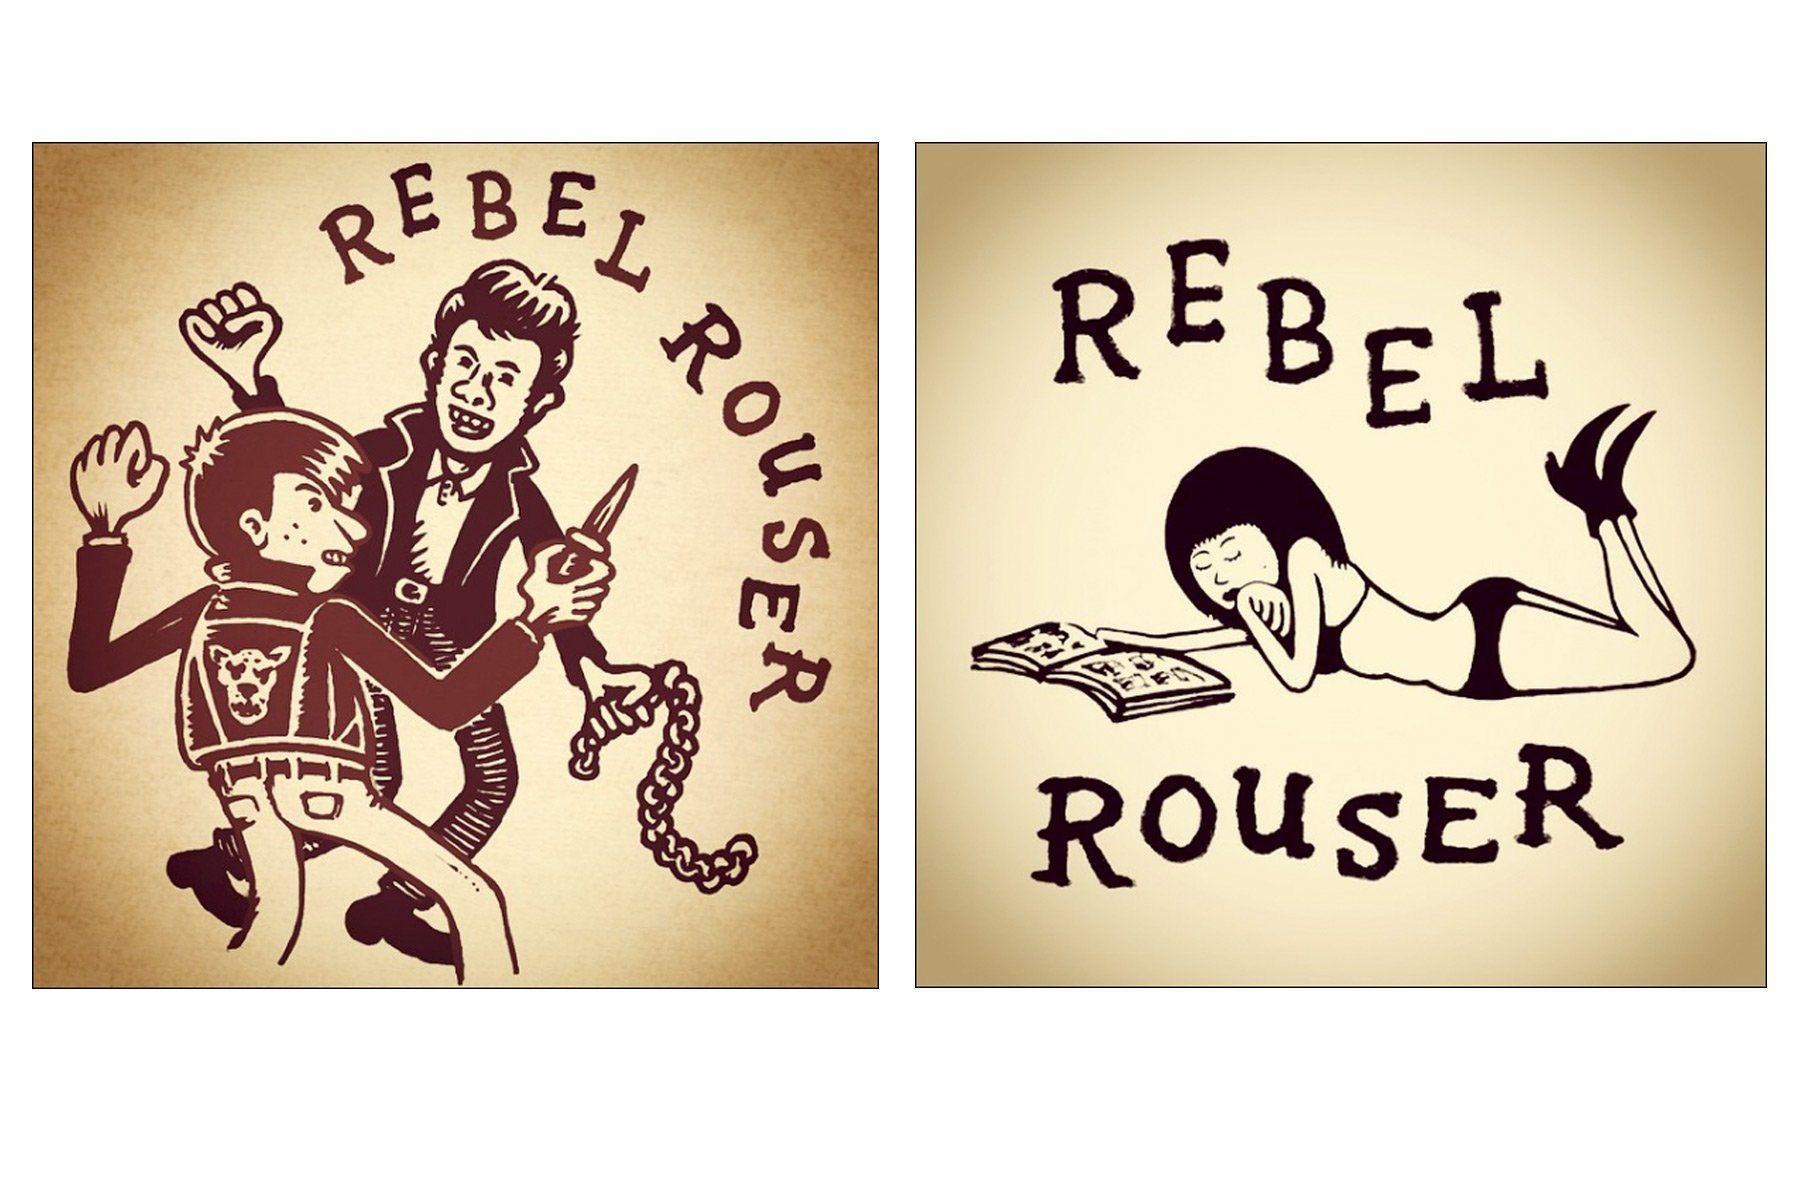 Rebel Rouser drawings by artist Avi Spivak. Ponyboy magazine.